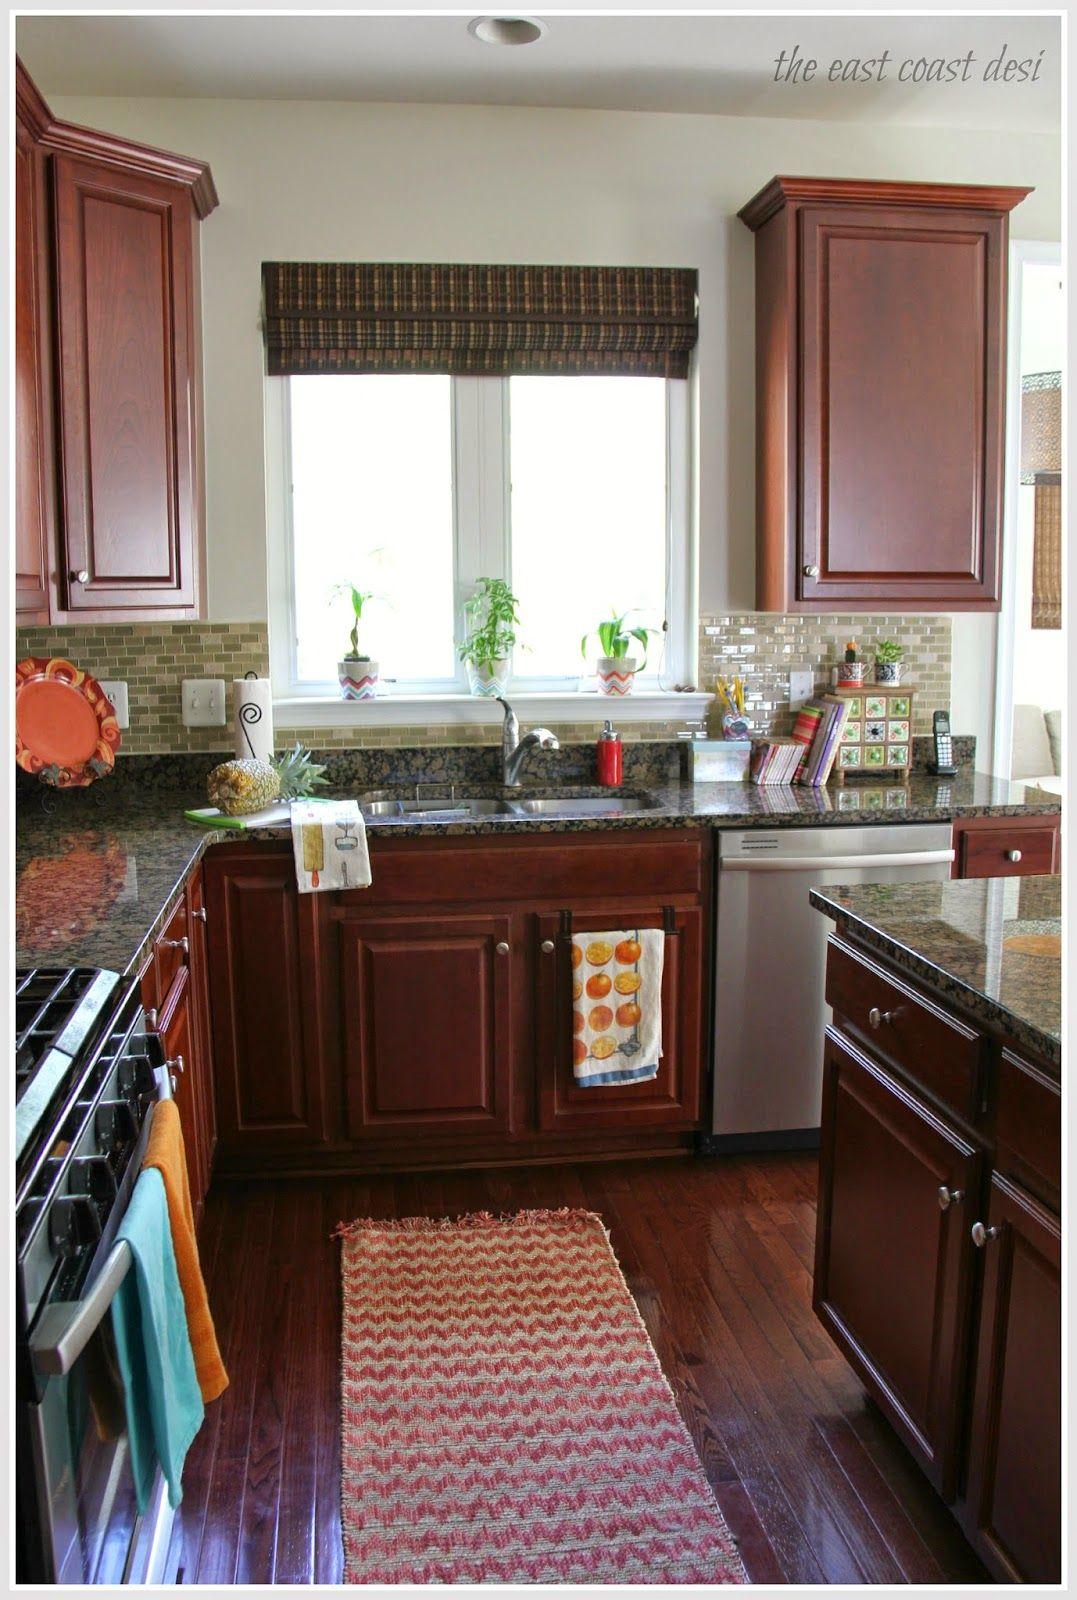 Indian kitchen design pinterest - The East Coast Desi Home Decor Conservatory Decorkitchen Cabinetrykitchen Diningindian